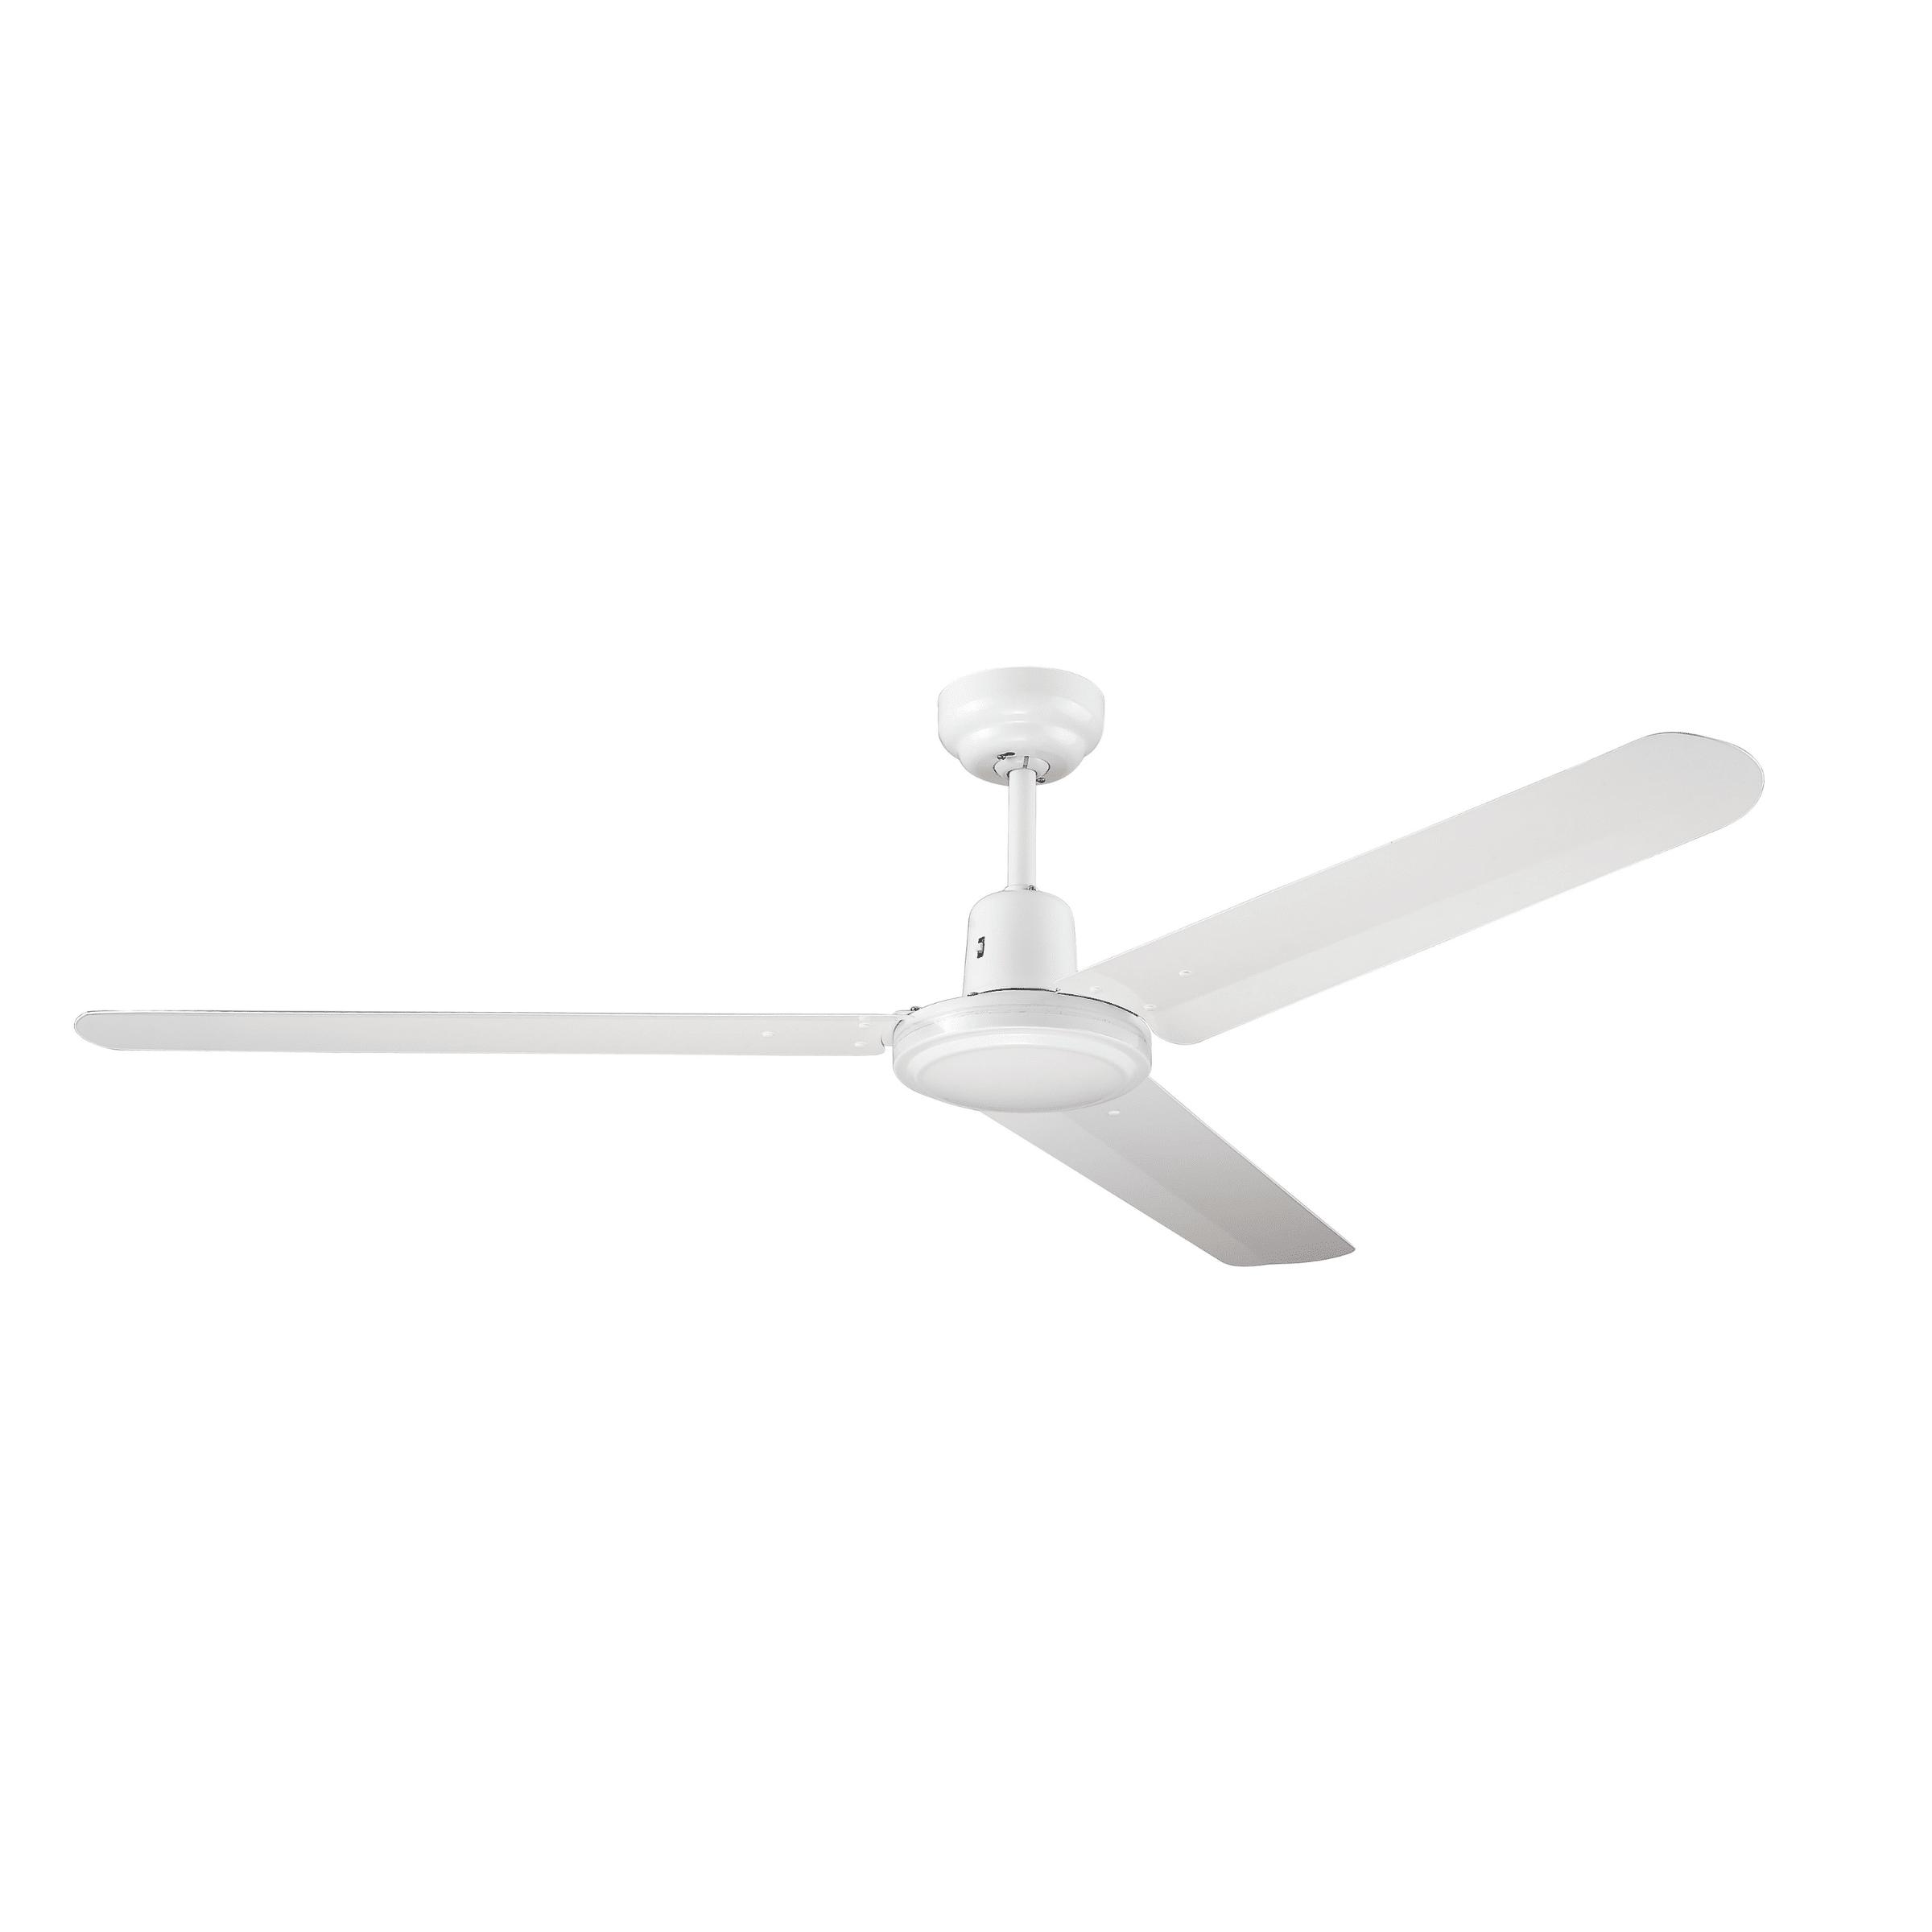 Hunter Pacific Tradey White 48 3 Blade Ceiling Fan Rovert Lighting